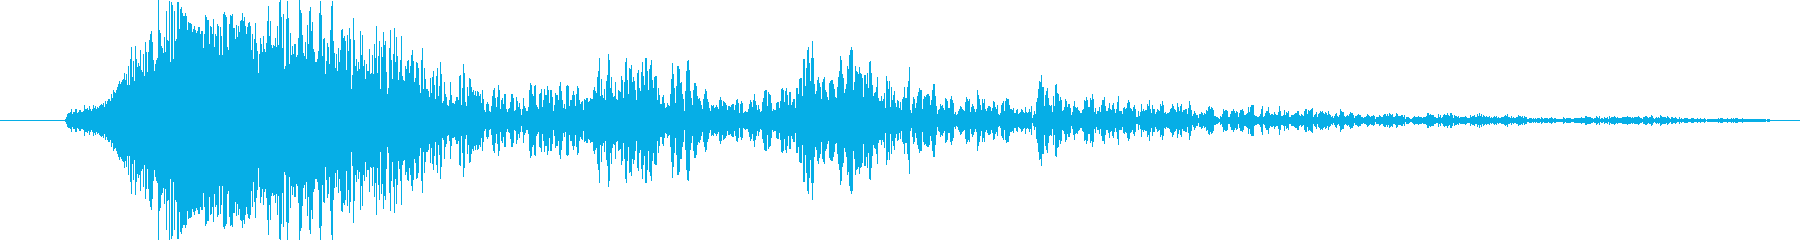 RPG ショットクローズ03の再生済みの波形